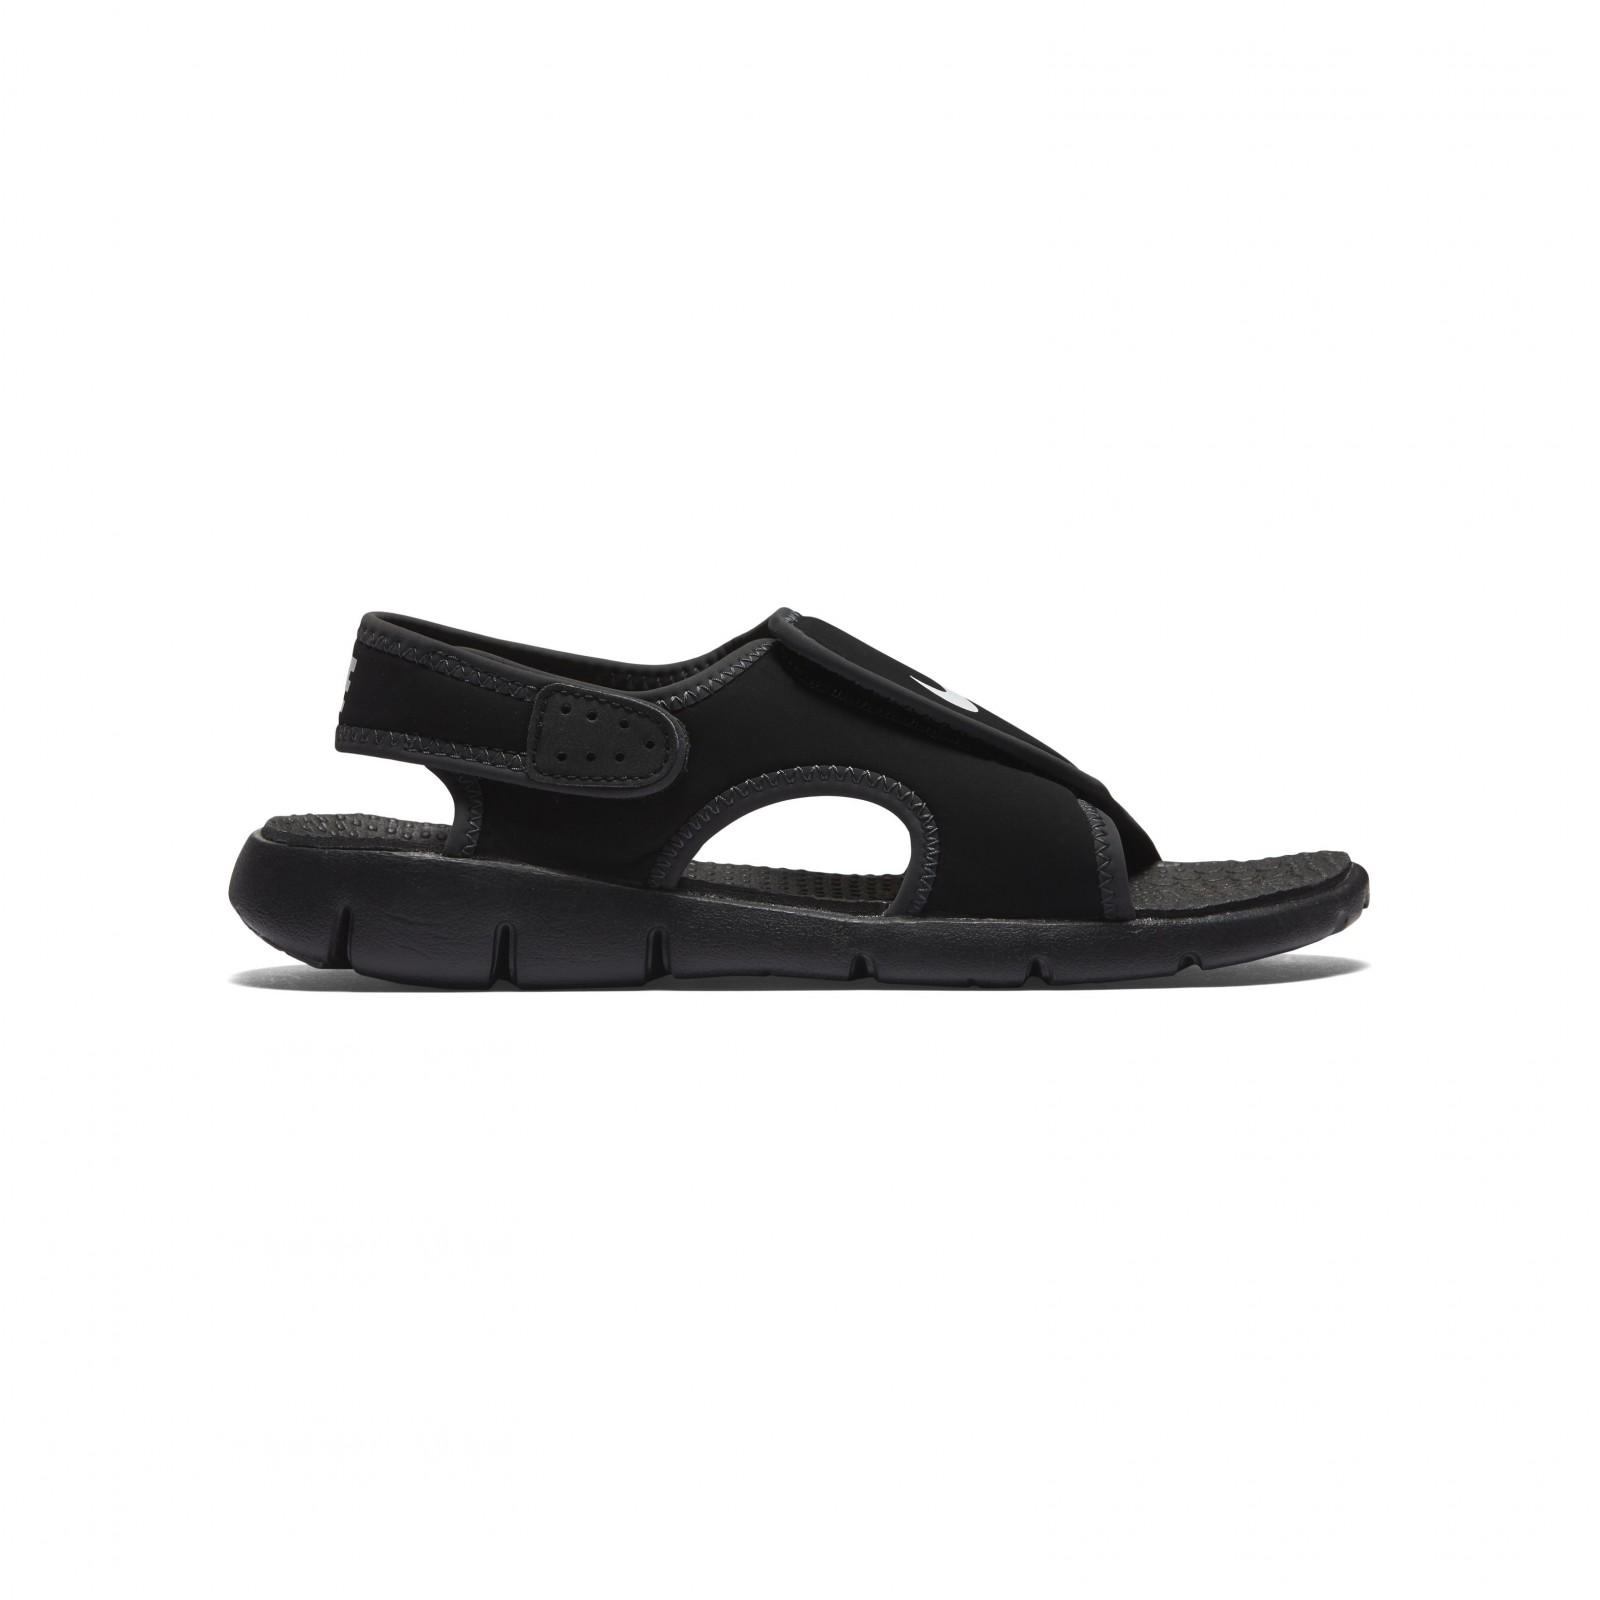 6c1b95511c9f Dětské sandále Nike SUNRAY ADJUST 4 (GS PS)